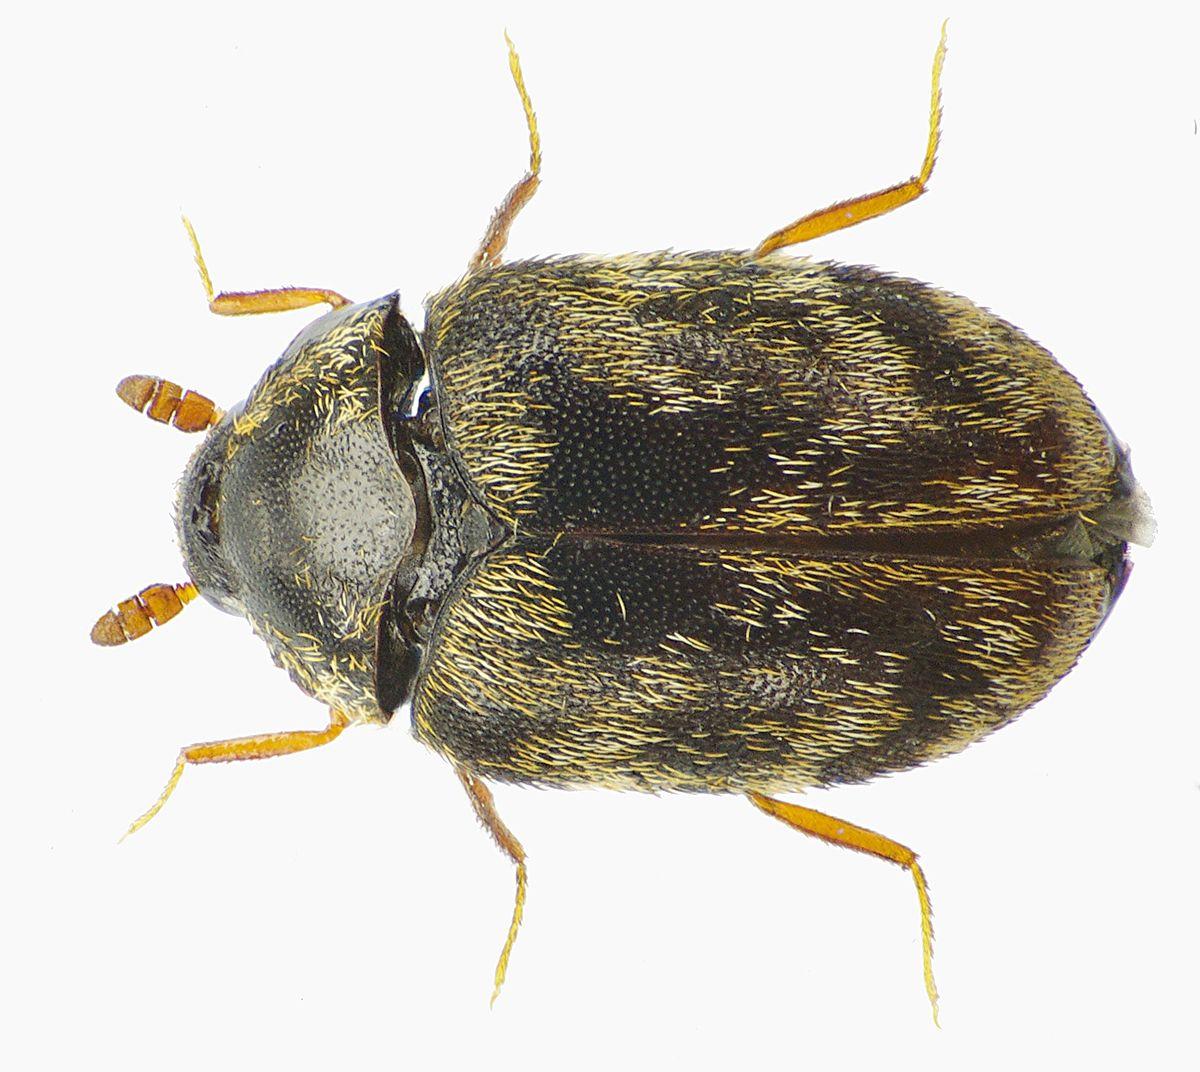 Anthrenocerus Australis Wikipedia